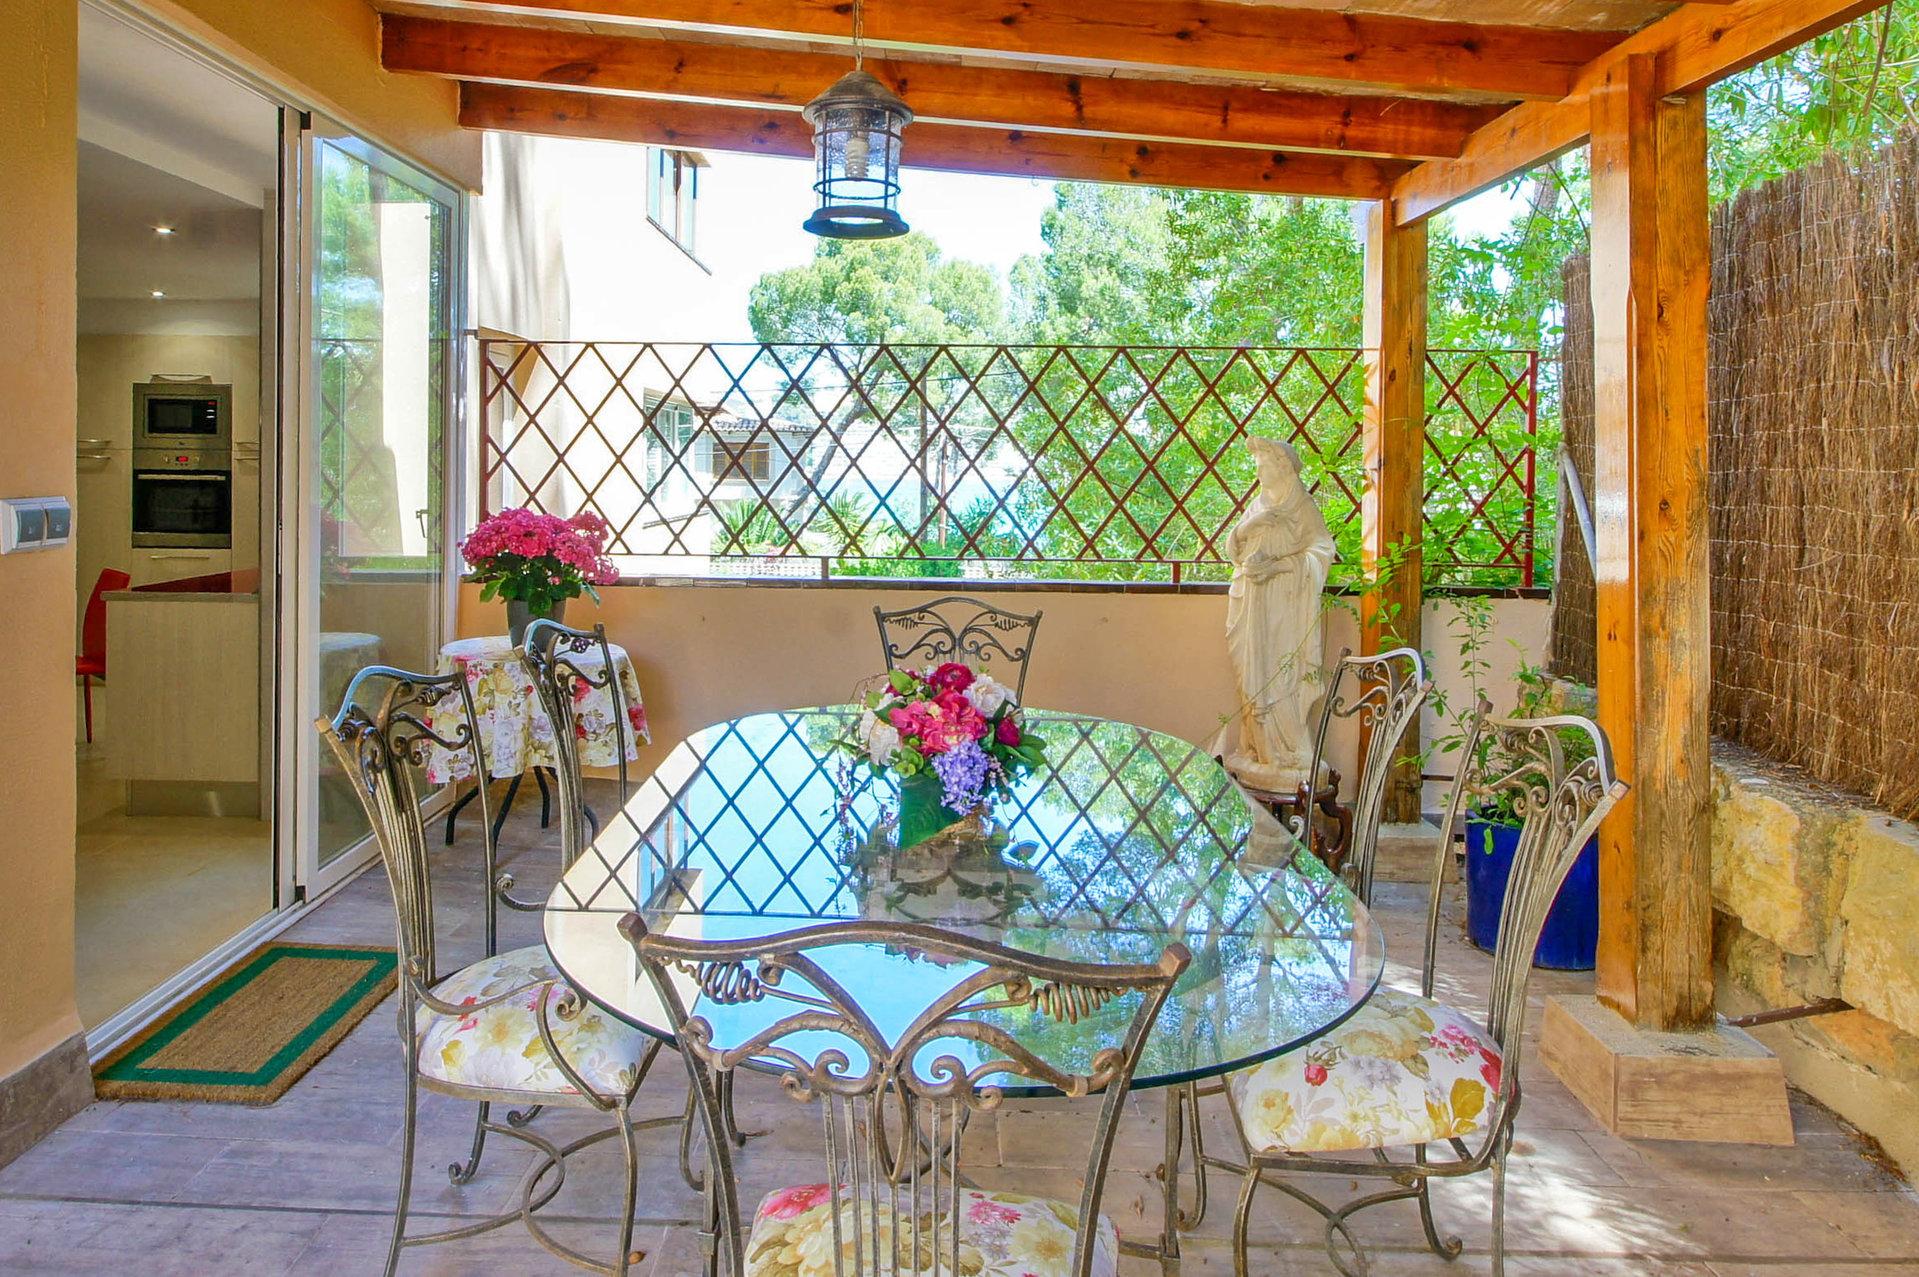 Ad Sale Apartment Santa Ponsa (07180), 4 Rooms ref:V0432SP